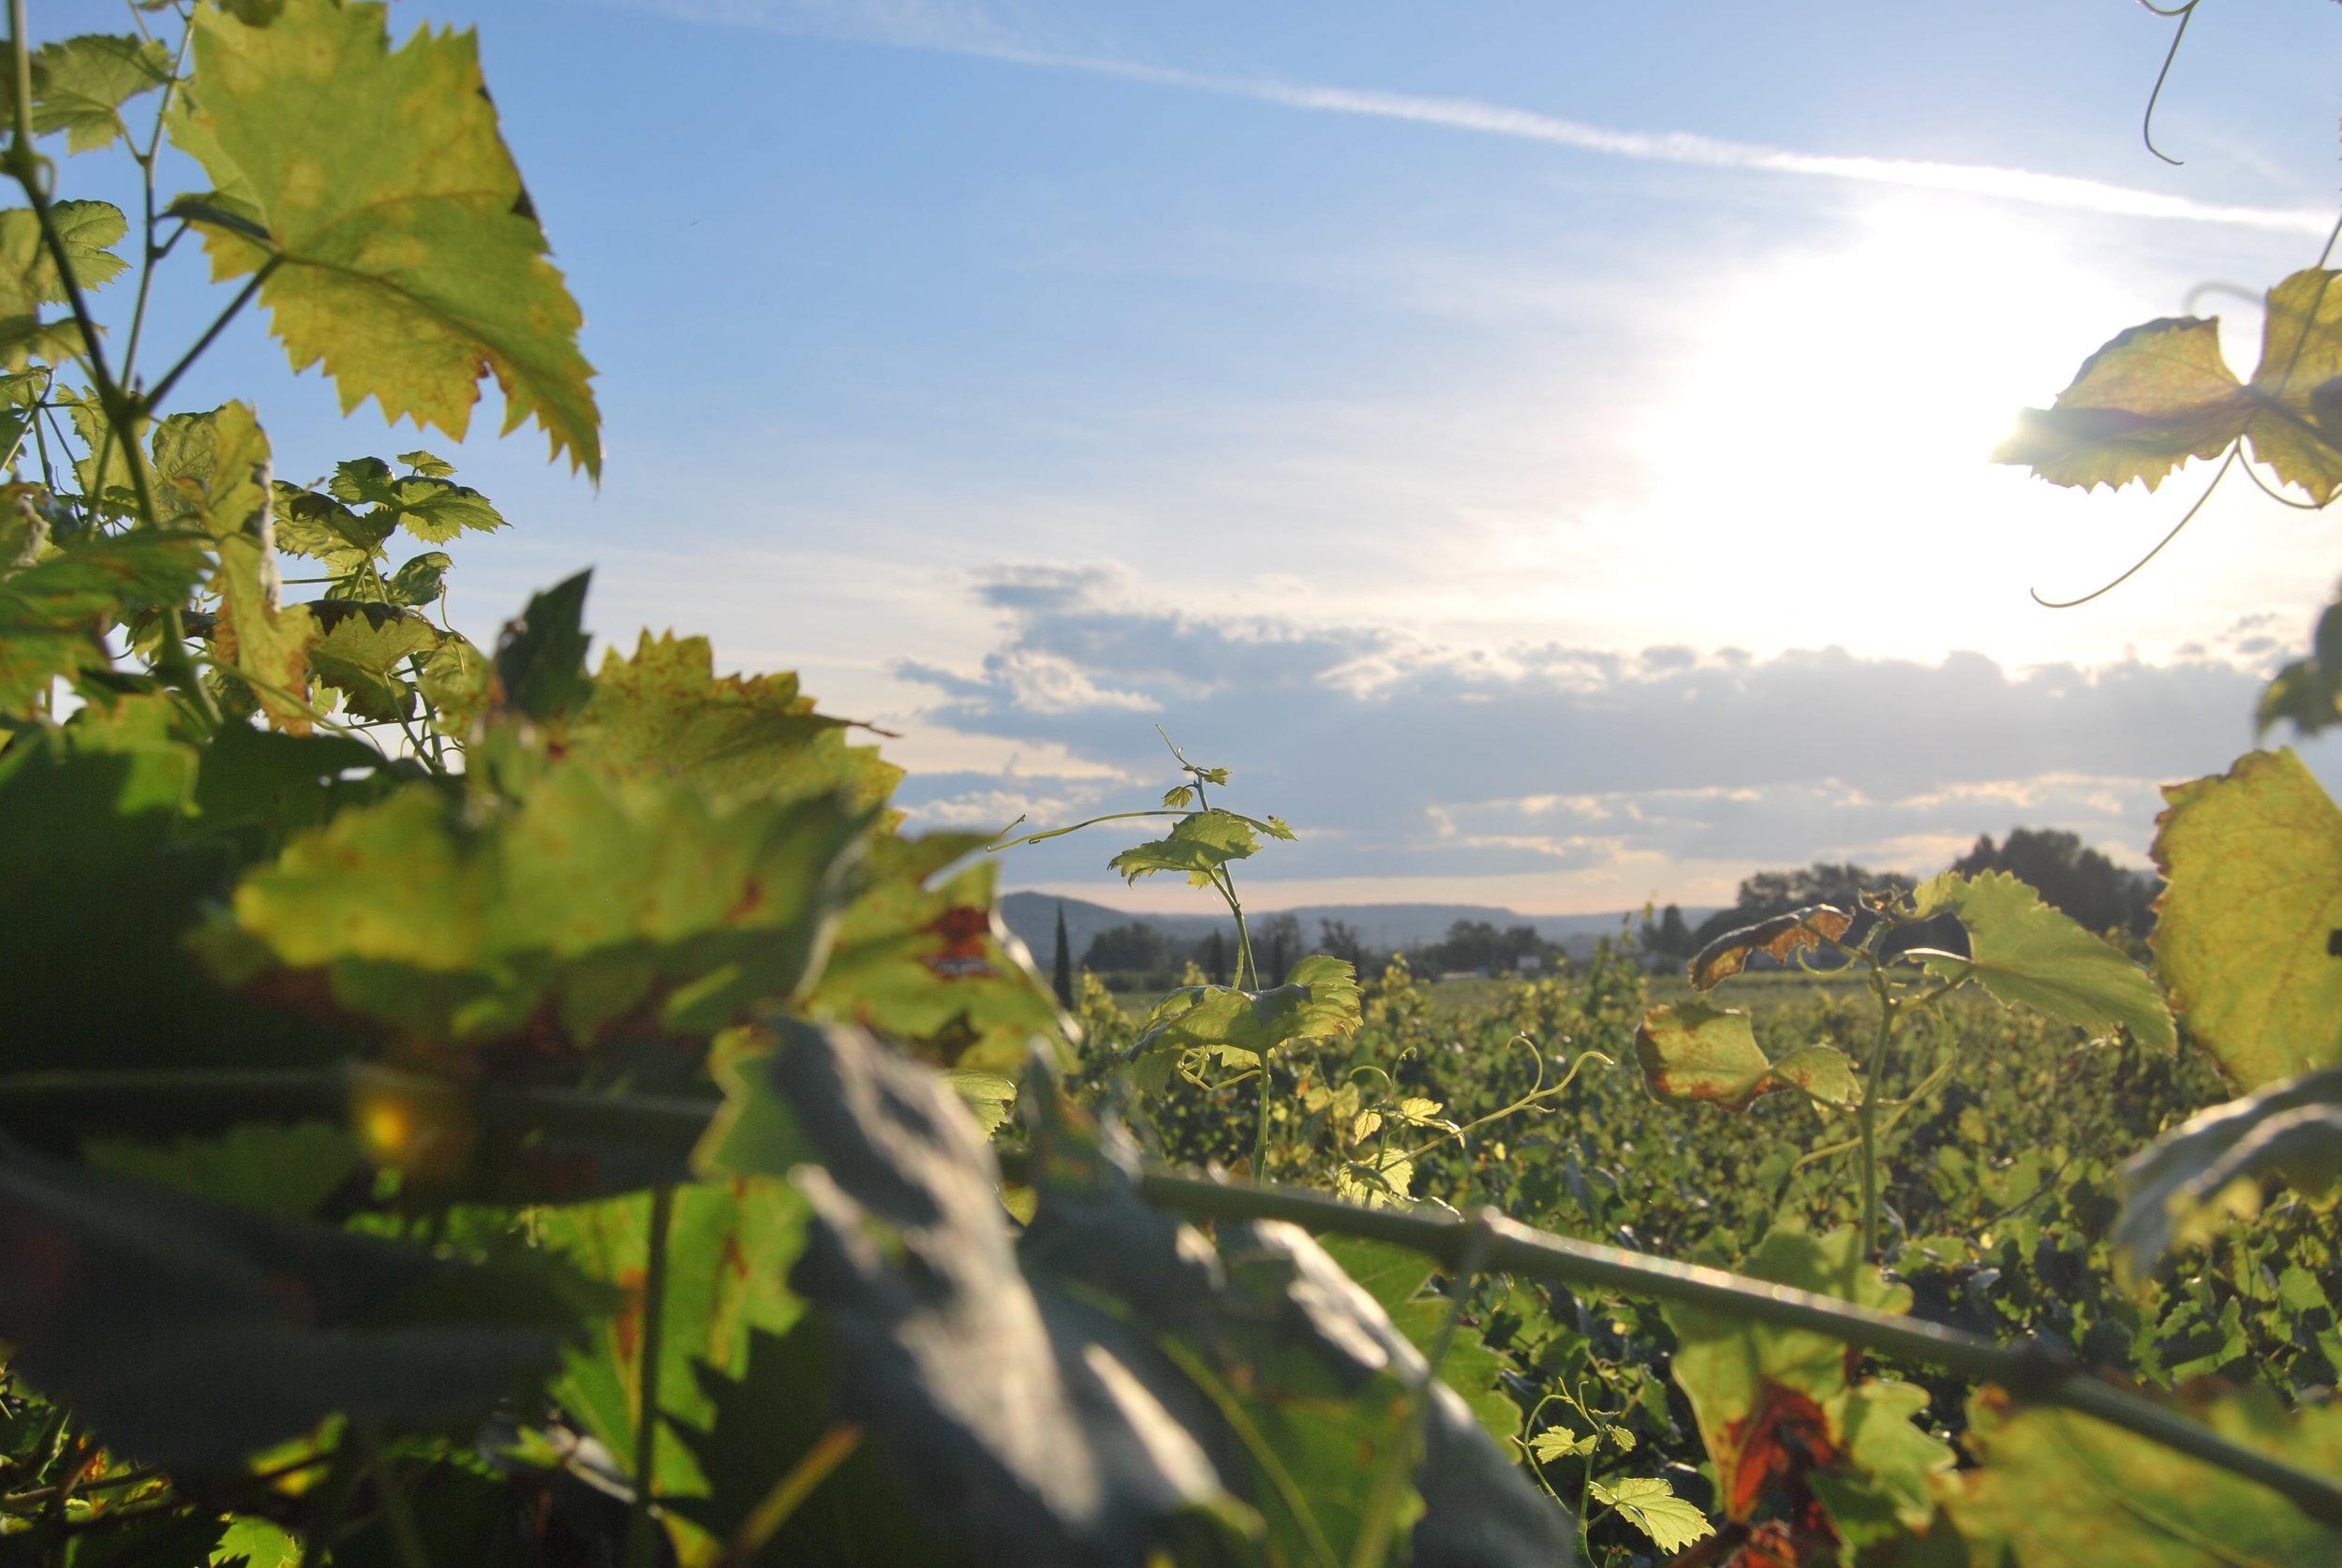 A vineyard in the summertime sun